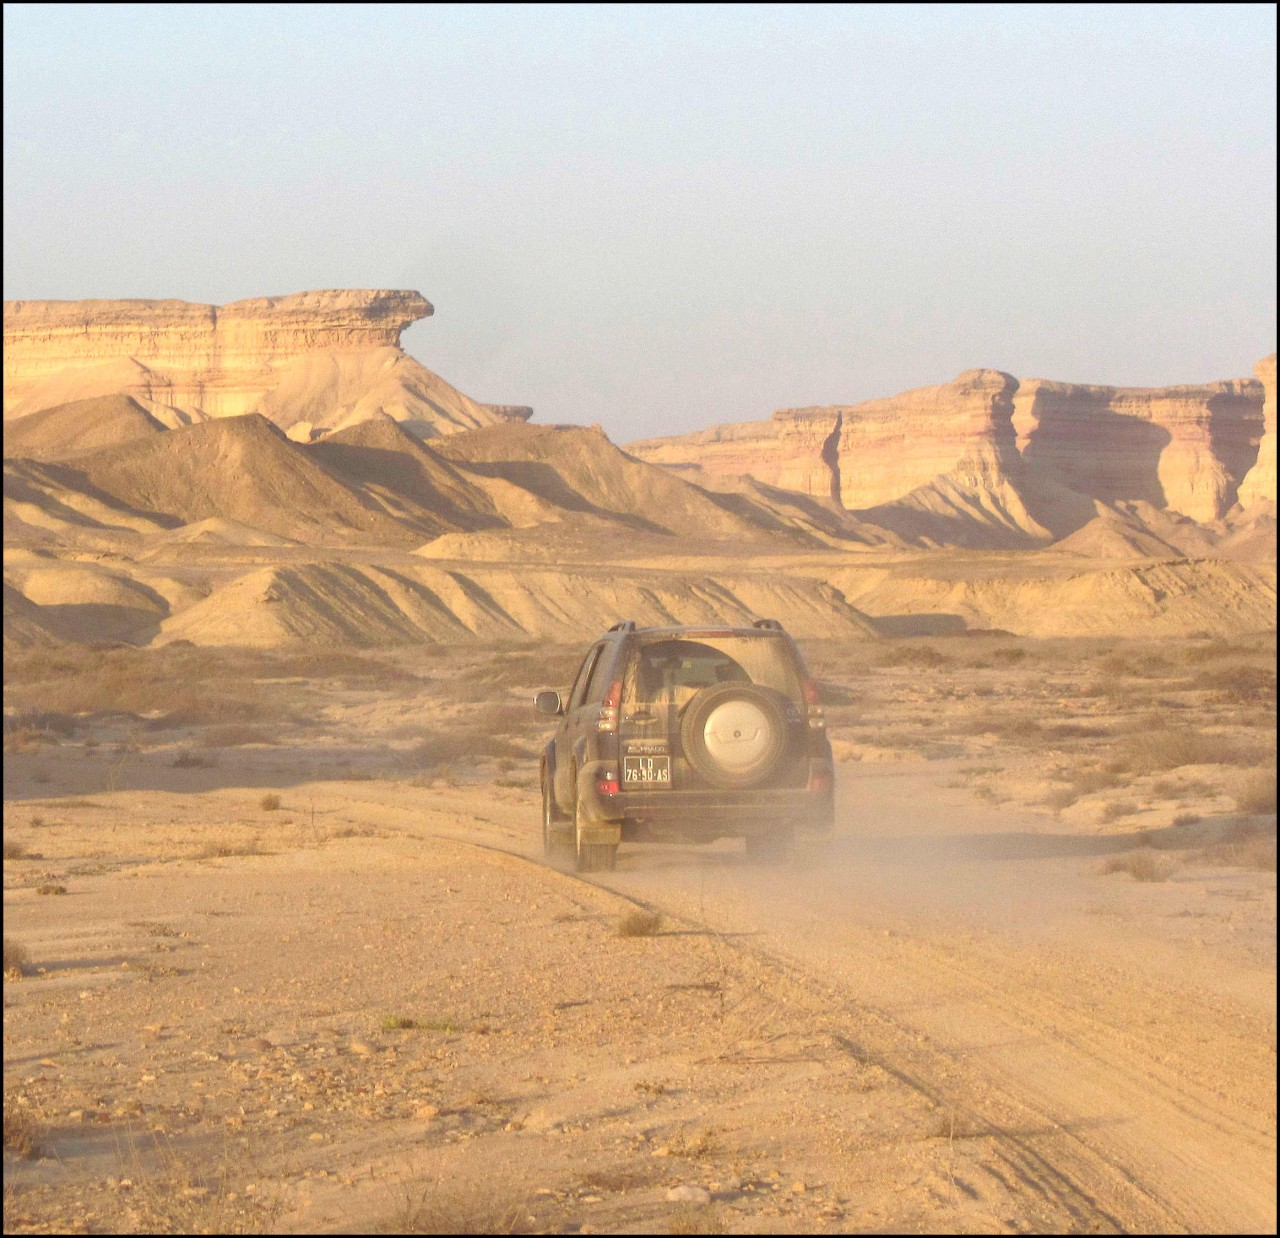 Desert de Namibe